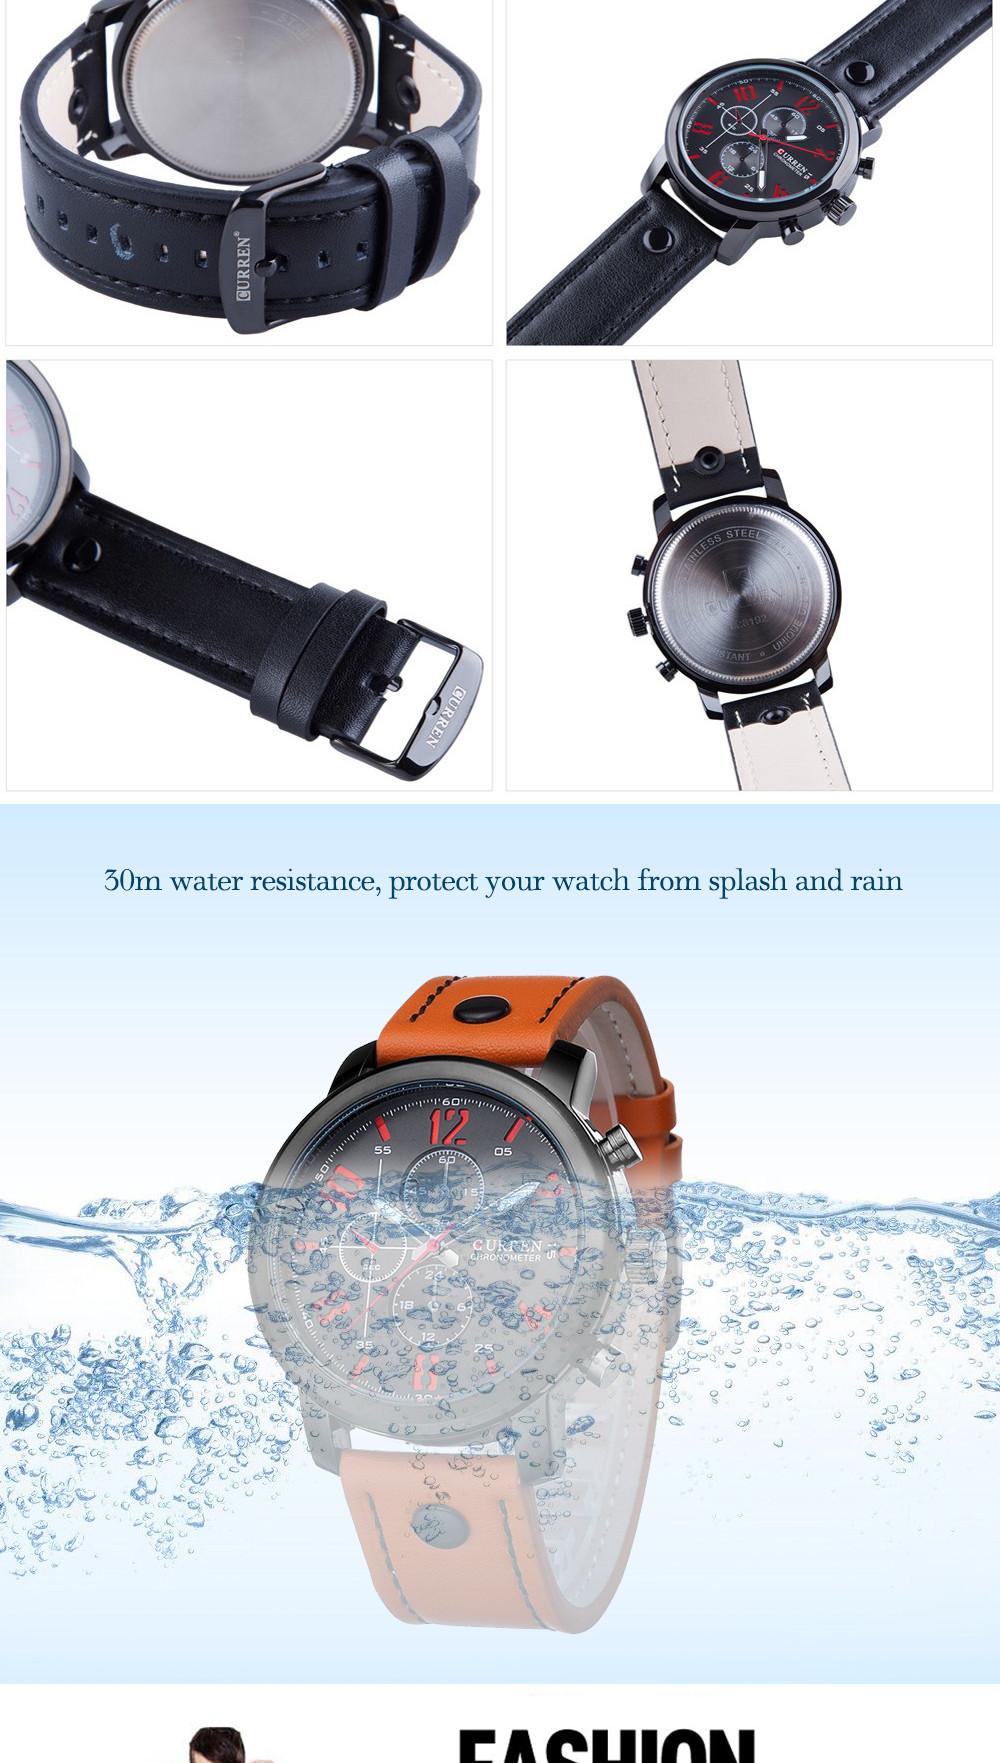 2016 CURREN Guys Watches Luxury Informal Guys Watches Analog Defense force Activities Watch Quartz Male Wristwatches Relogio Masculino (5)